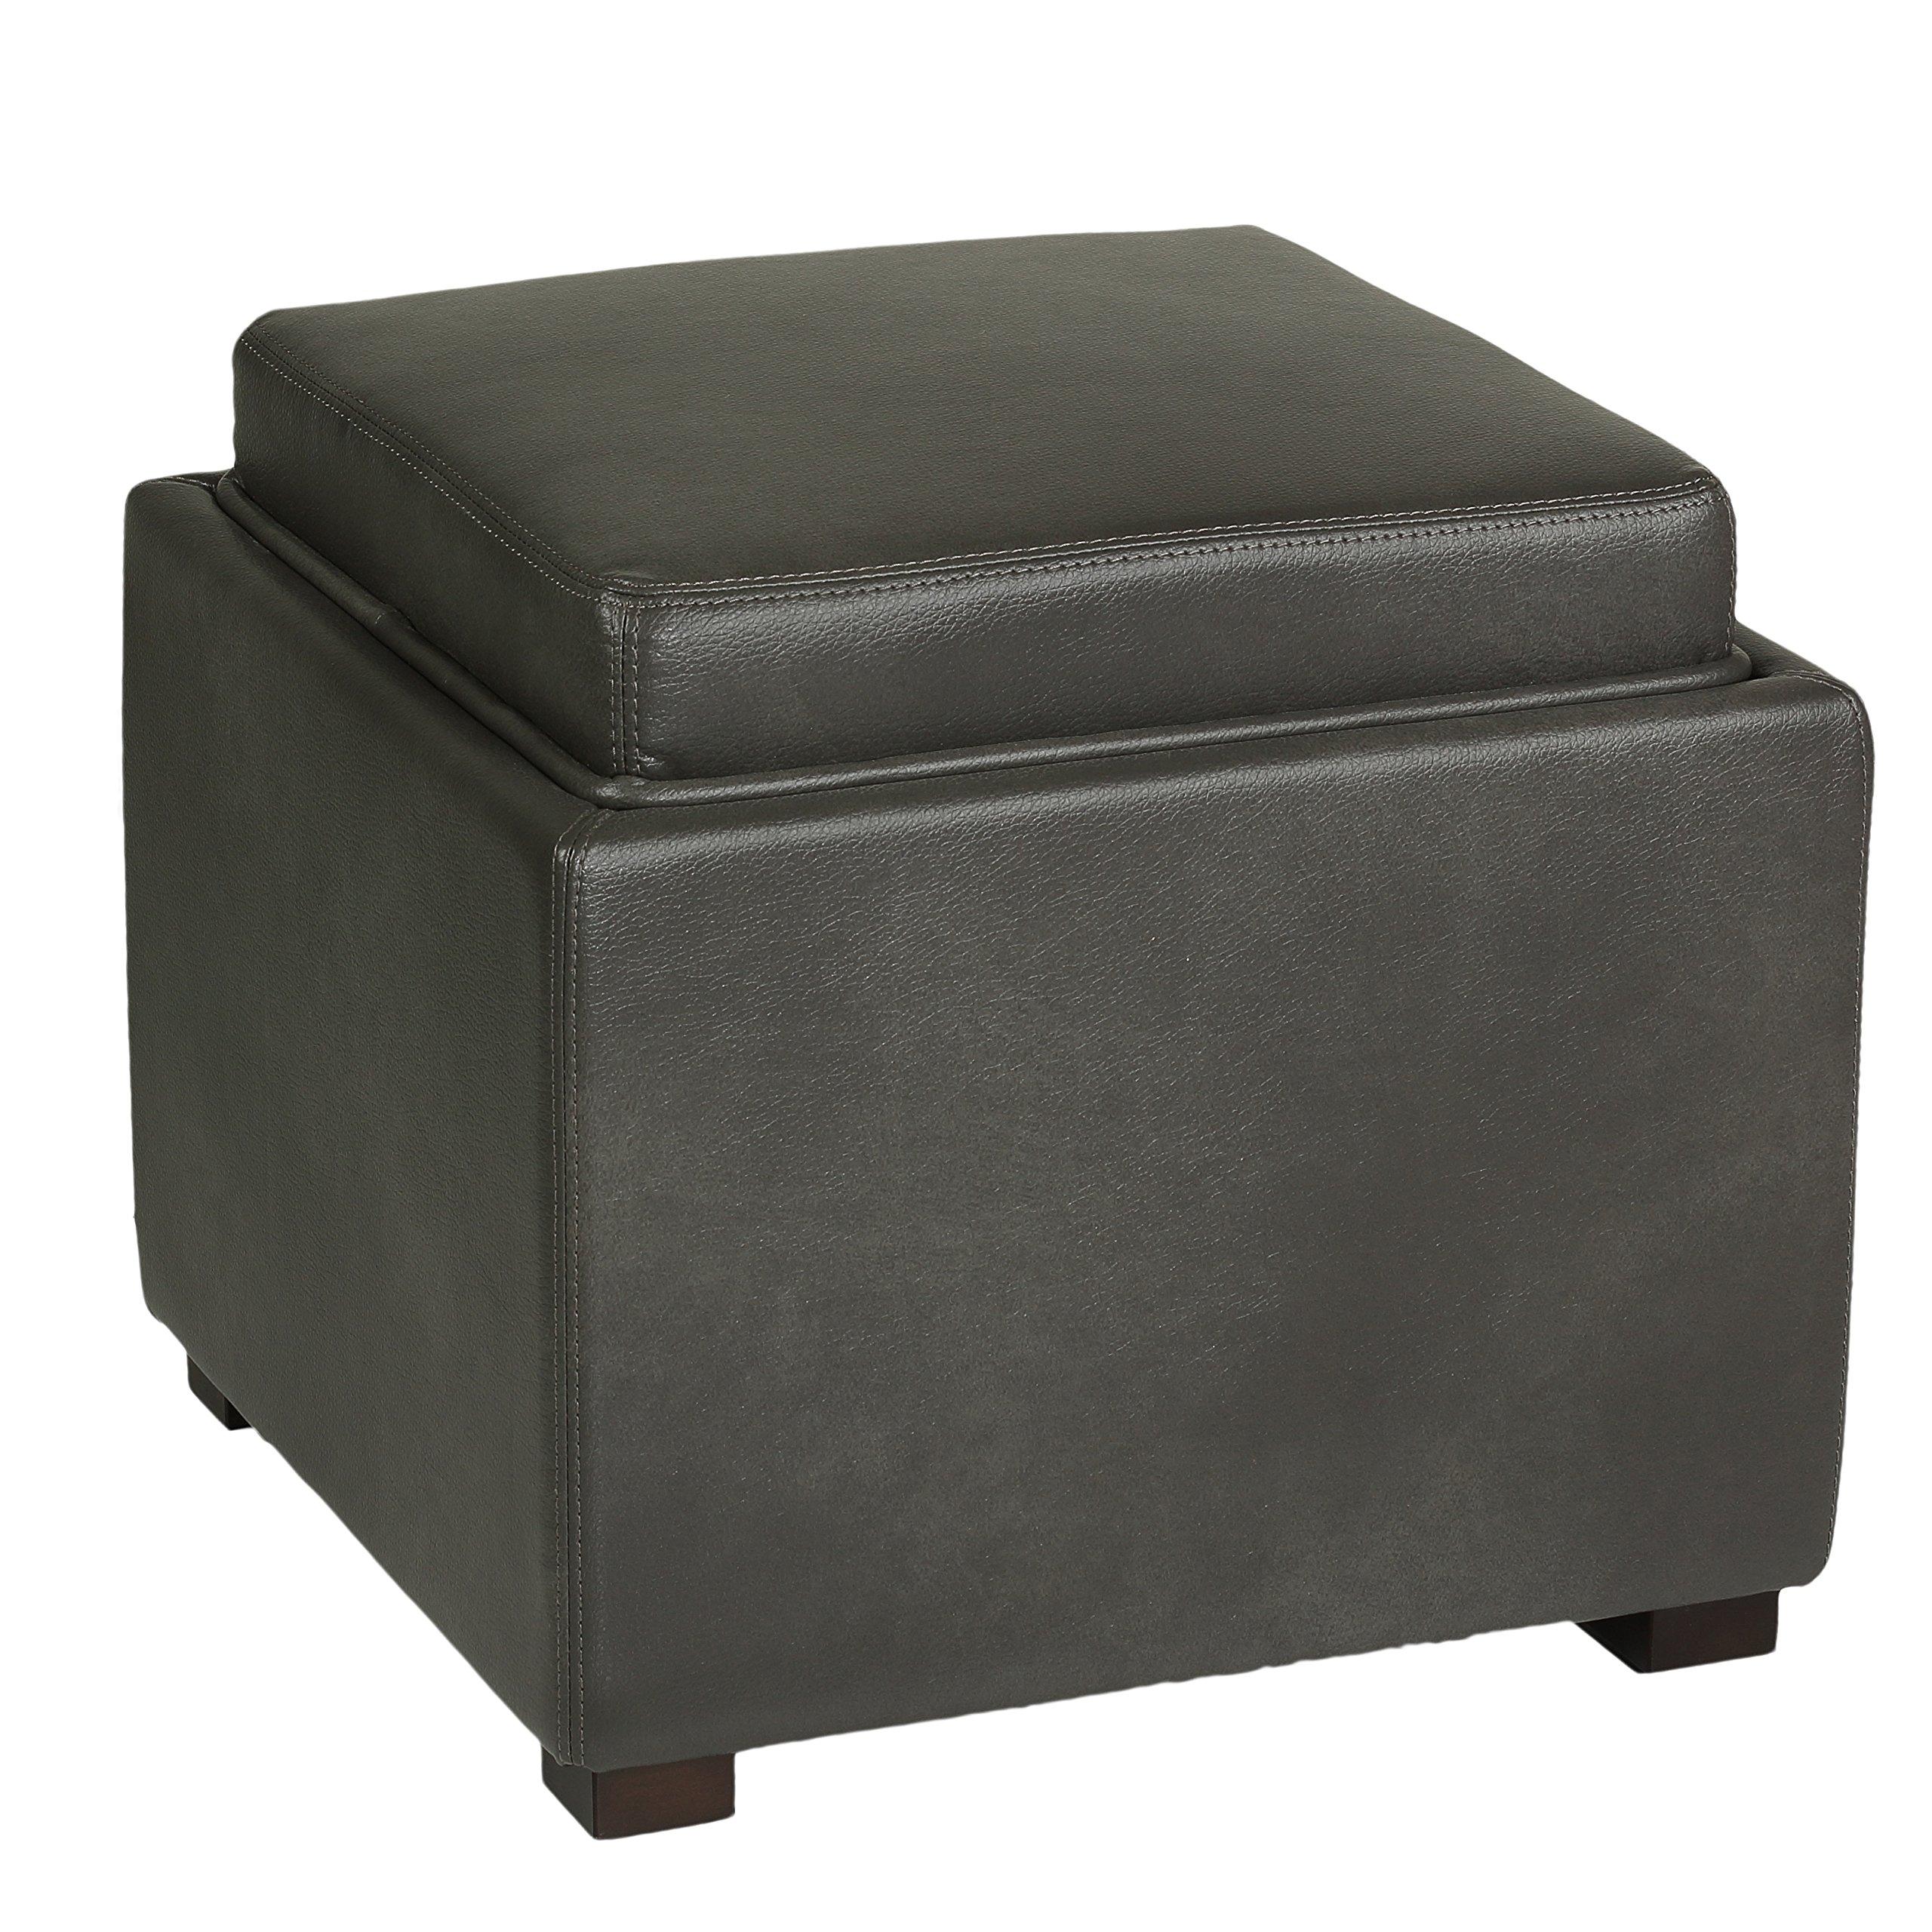 Cortesi Home Mavi Grey Top Tray Storage Cube Ottoman In